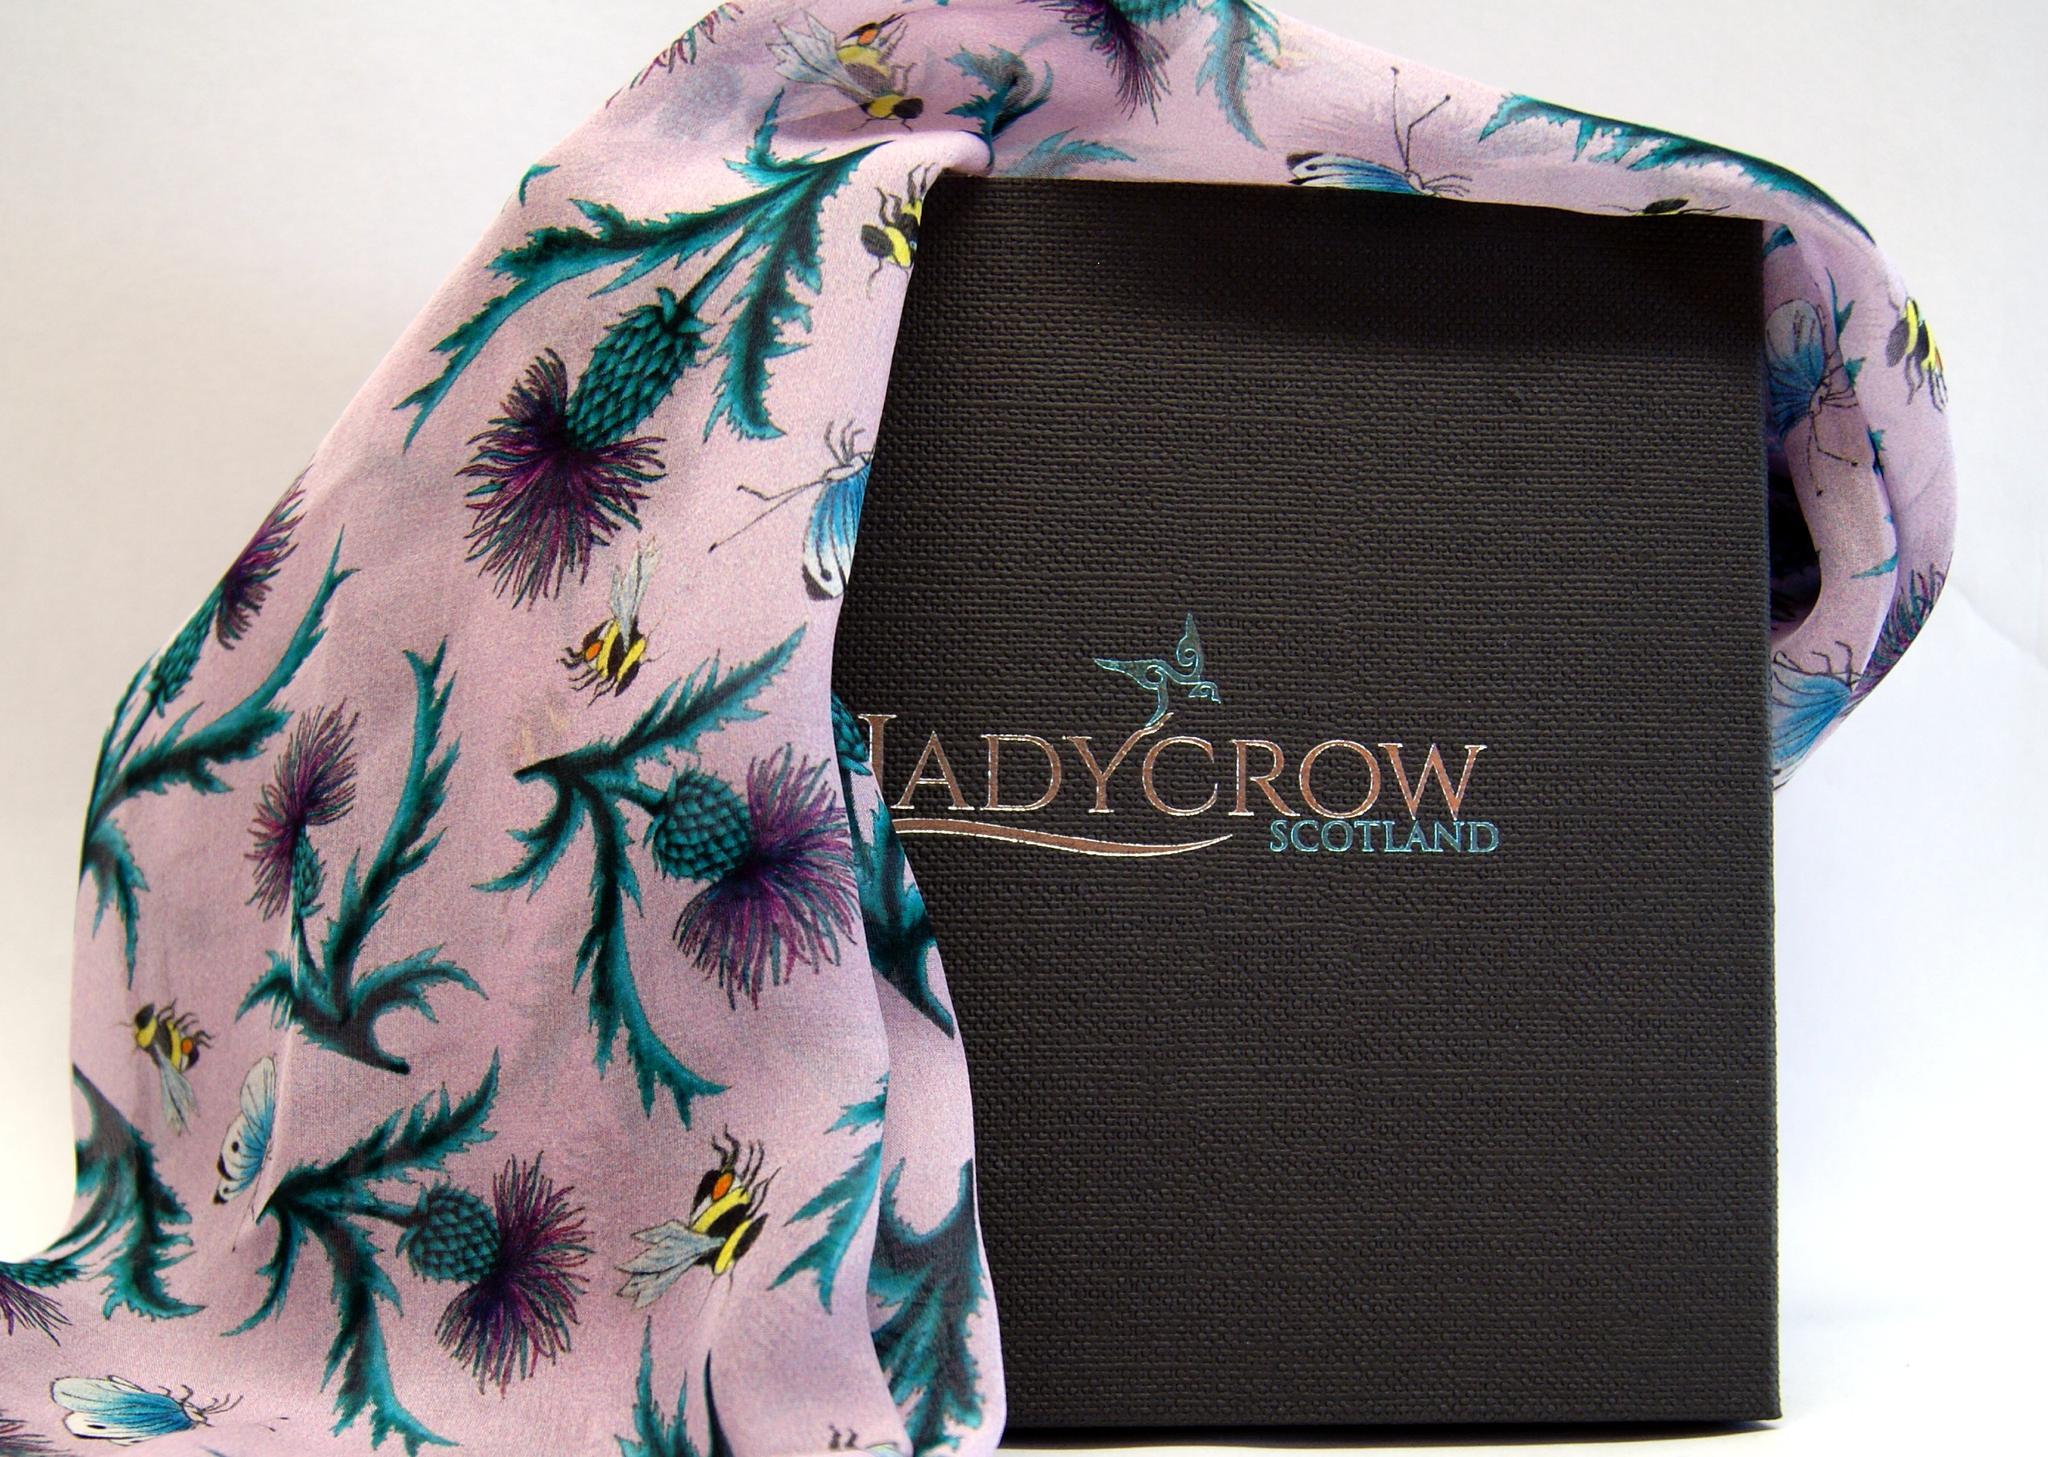 Ladycrow Silks/Glenshee P